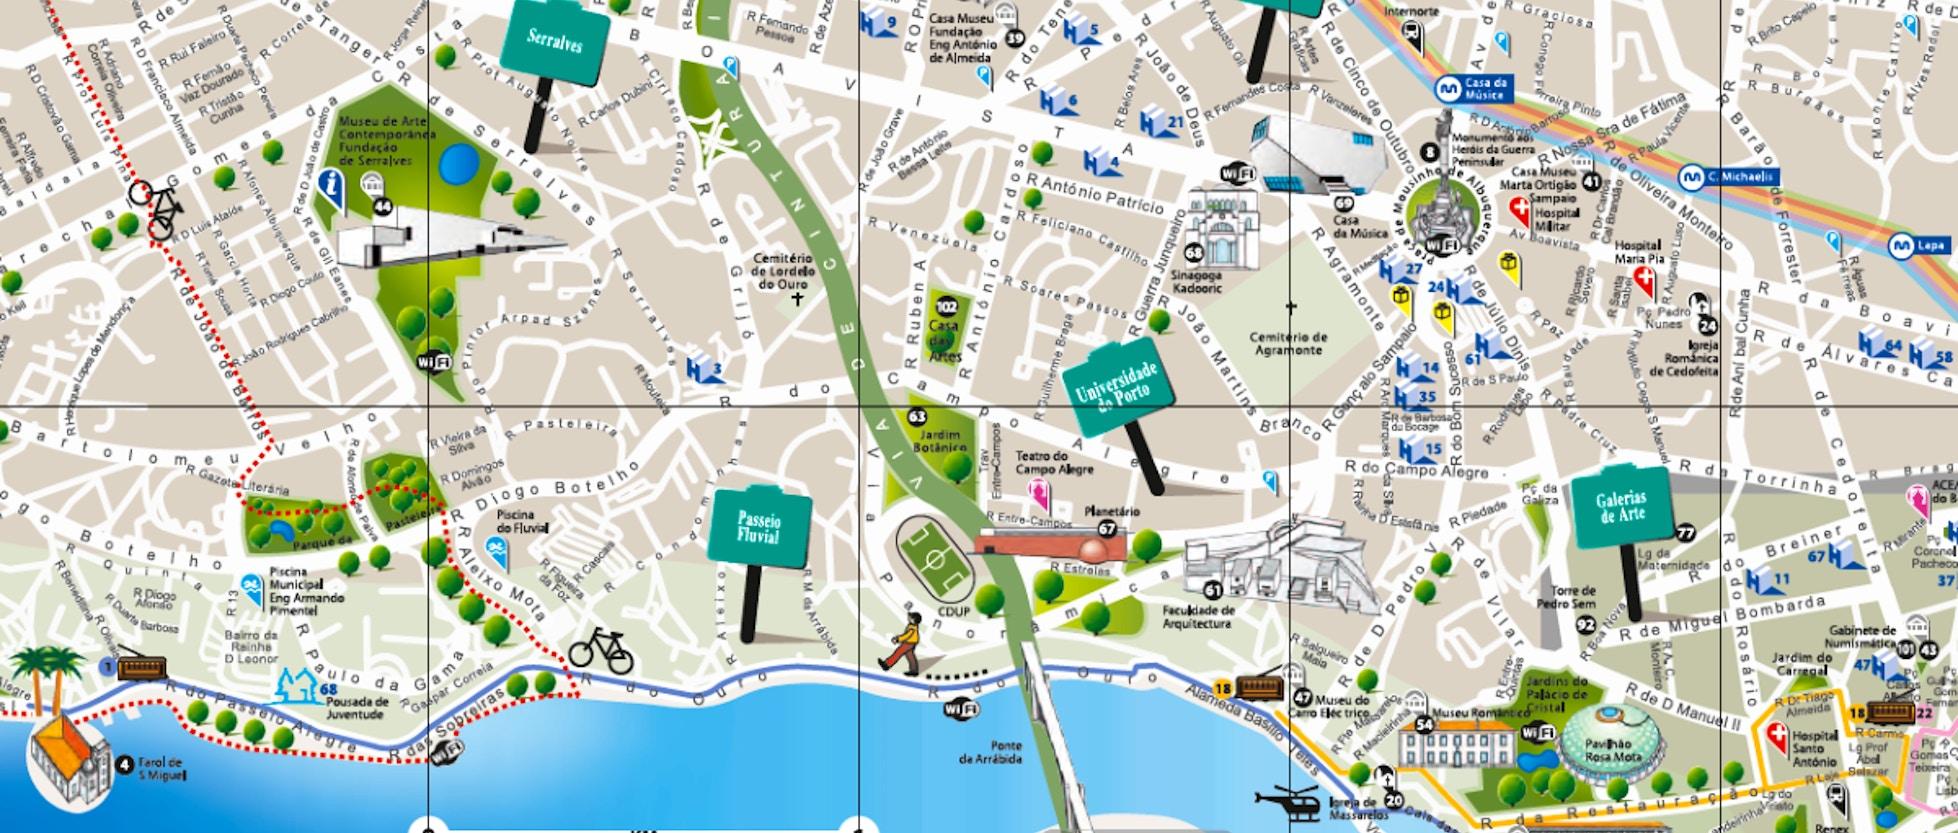 Cartina Metropolitana Di Parigi Da Stampare.Mappe Di Porto Da Stampare Attrazioni Metro Tram E Bus